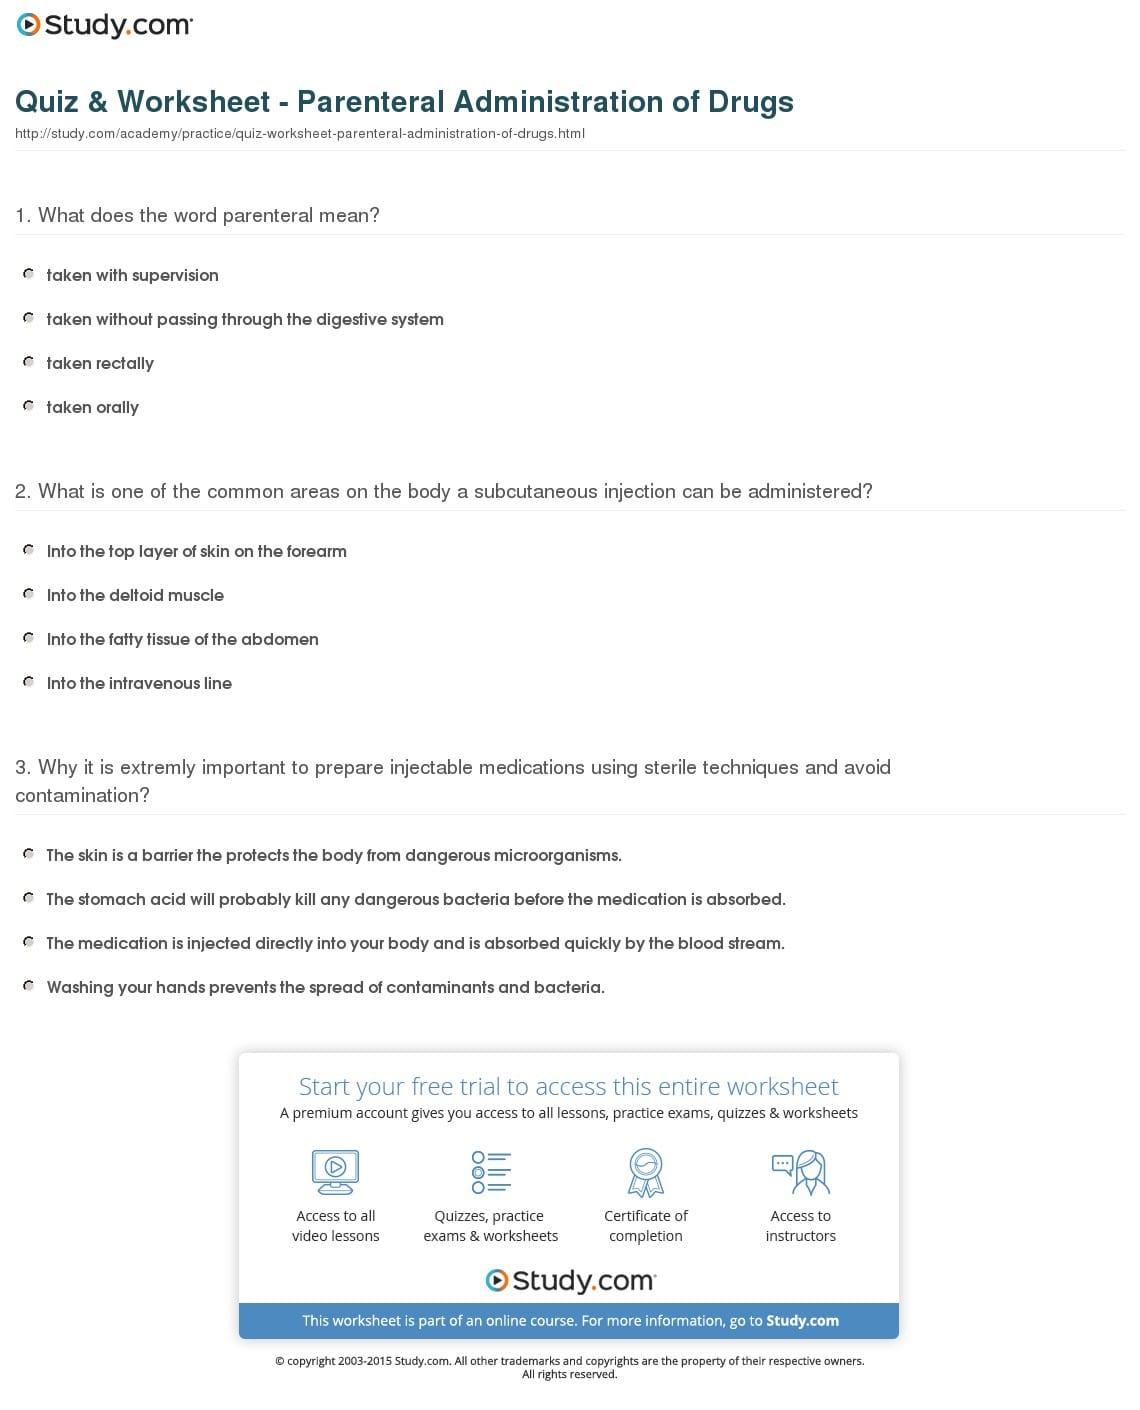 Quiz Worksheet Parenteral Administration Of Drugs